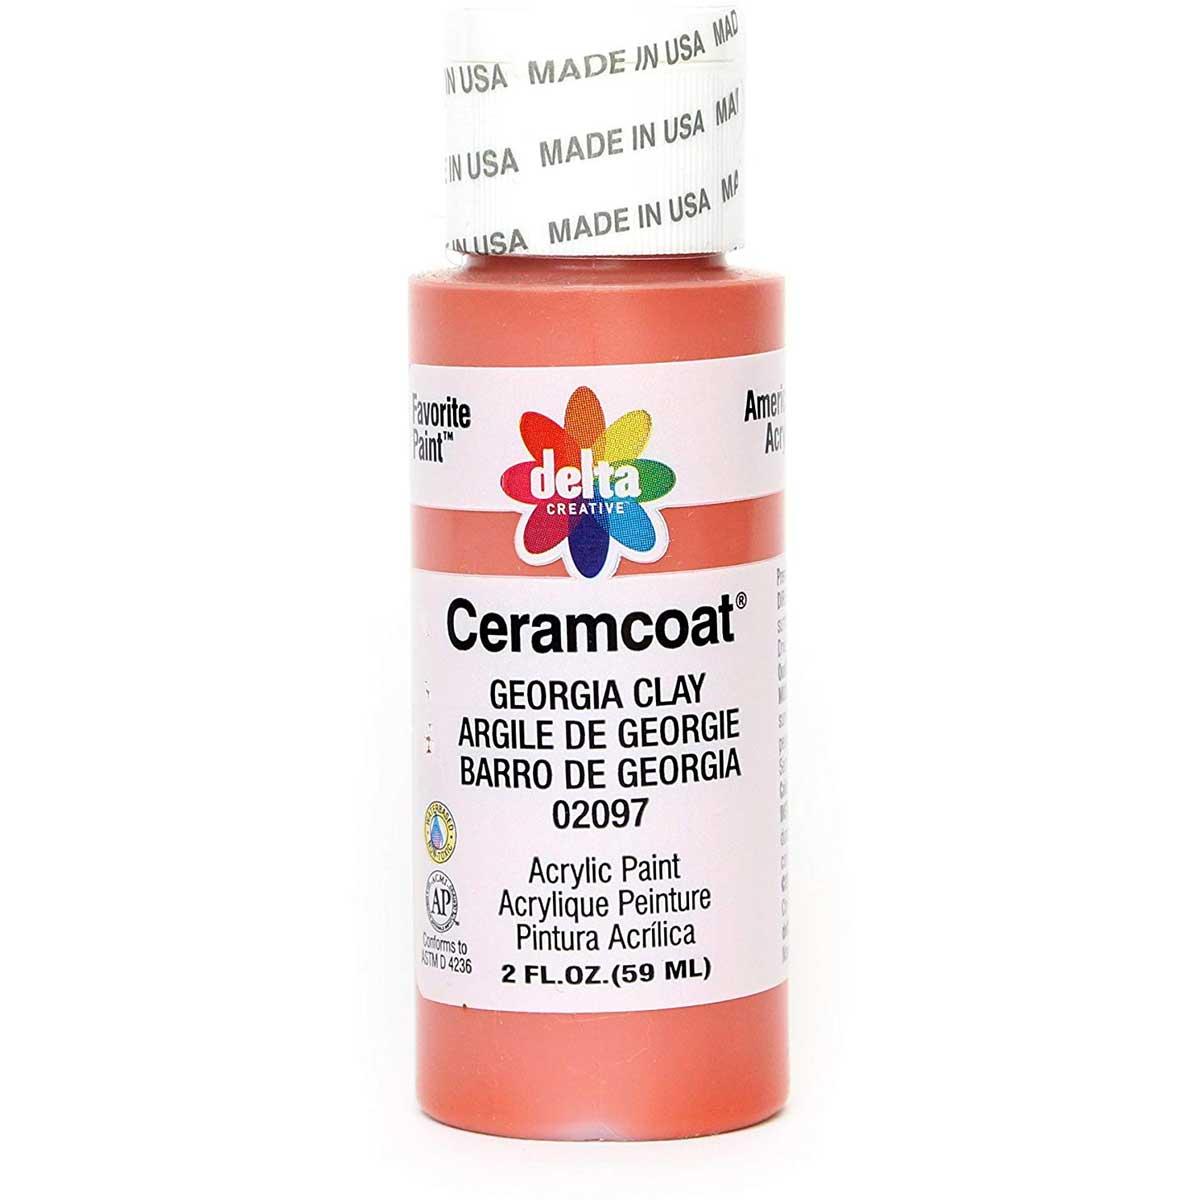 Delta Ceramcoat ® Acrylic Paint - Georgia Clay, 2 oz.